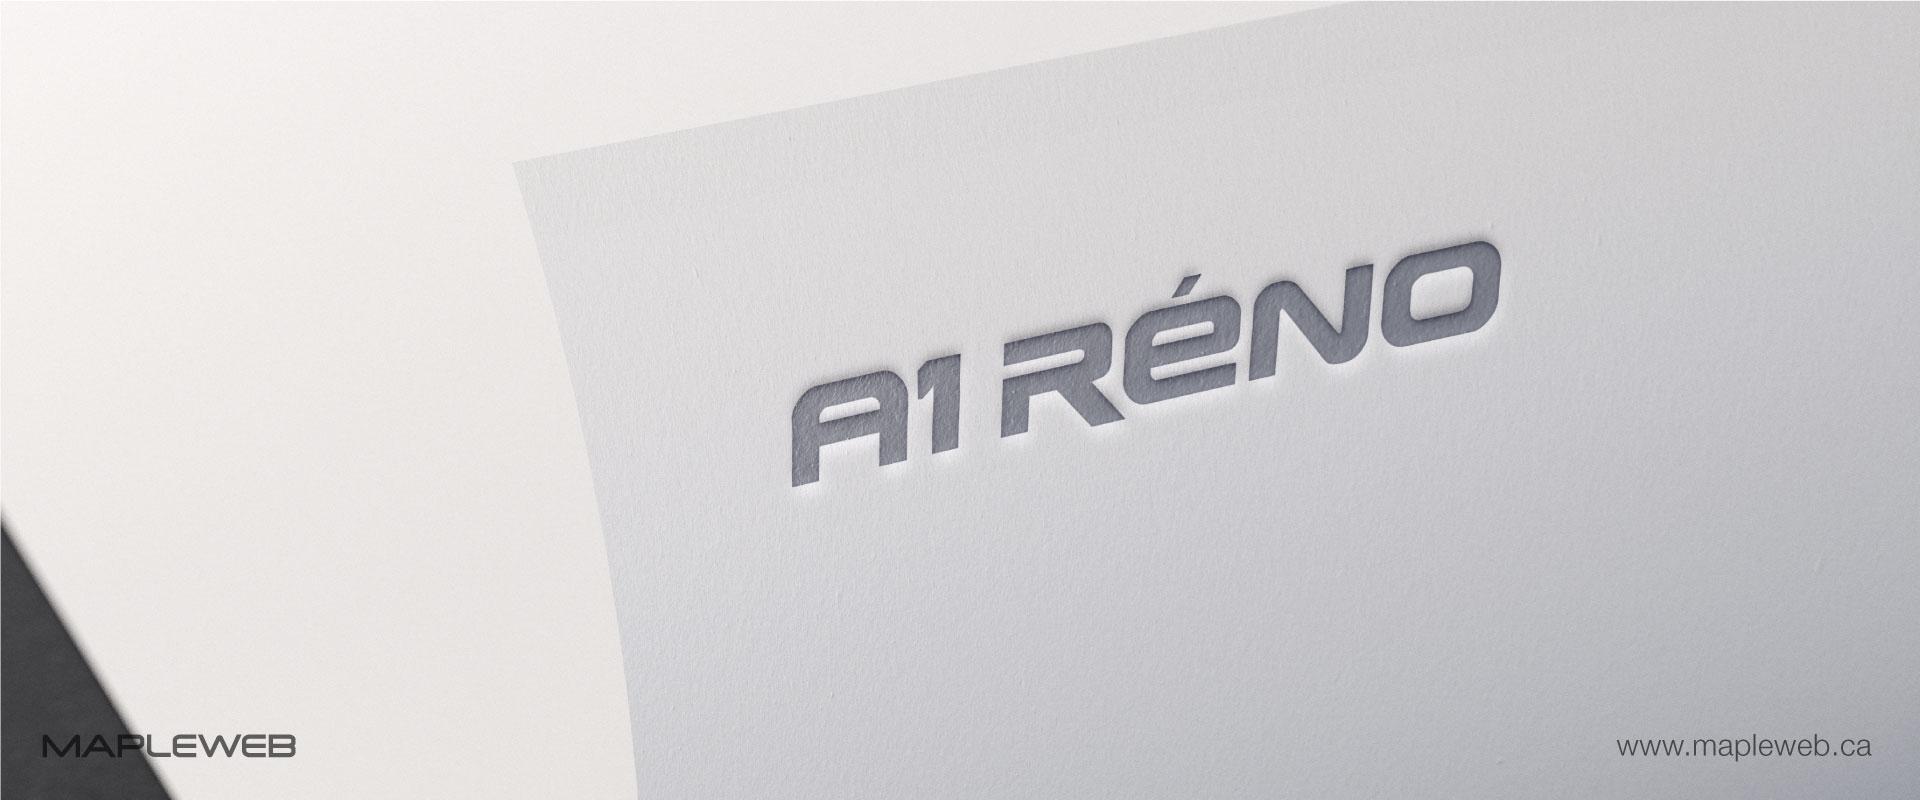 a1-reno-brand-logo-design-by-mapleweb-vancouver-canada-logo-paper-effect-mock